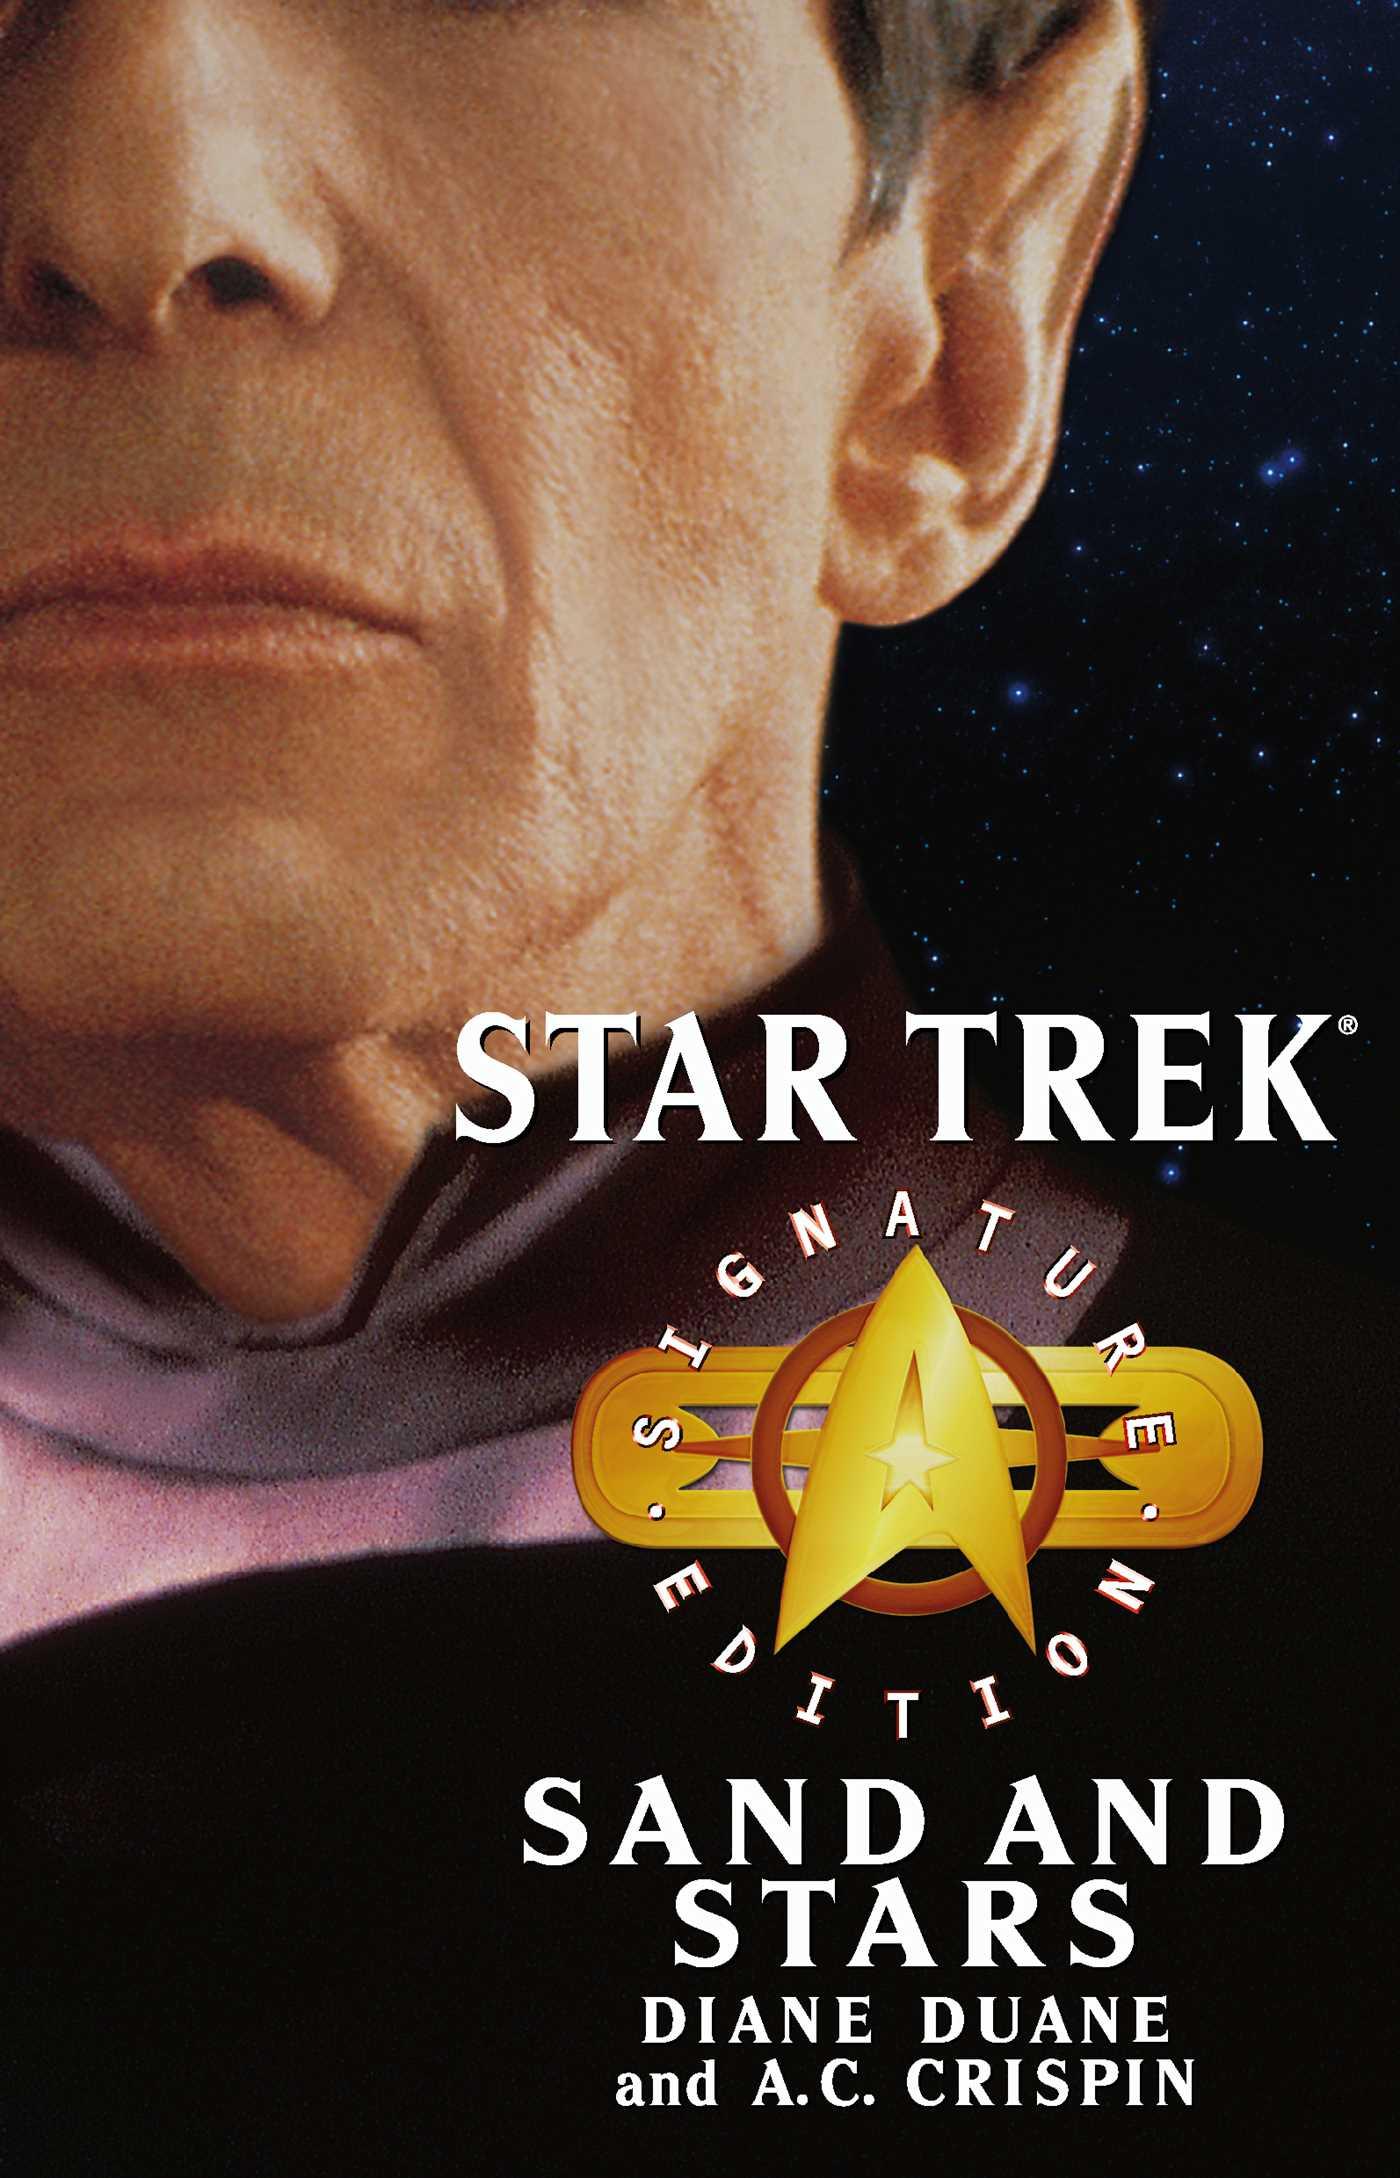 Star trek signature edition sand and stars 9781416500063 hr